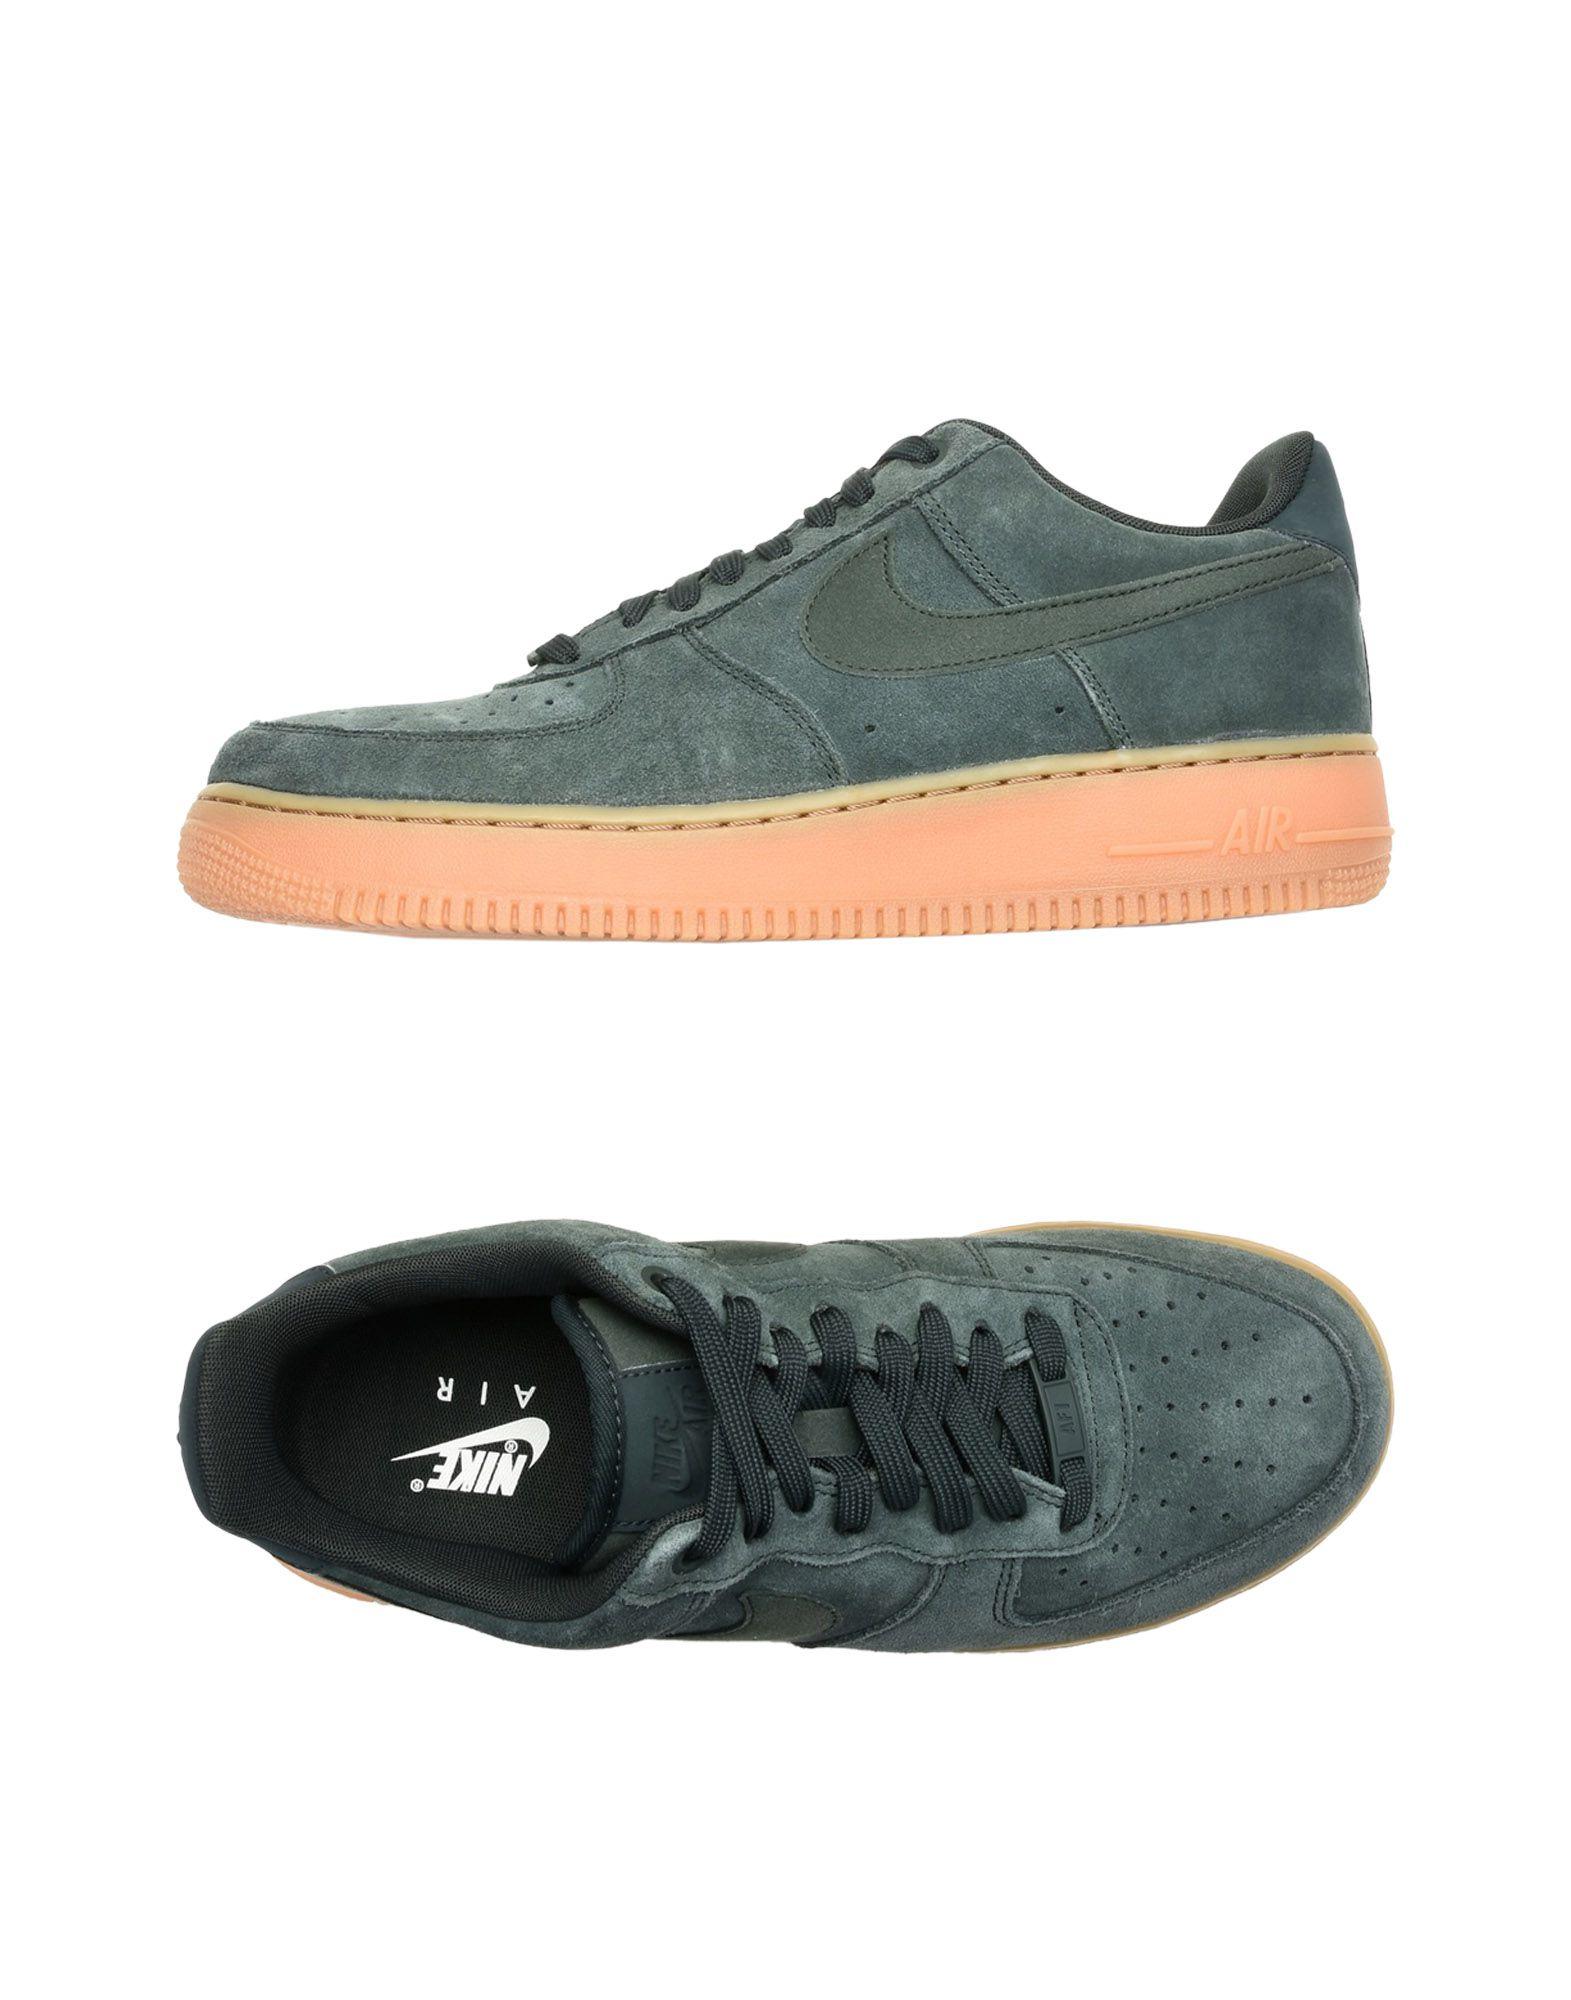 Rabatt echte Schuhe Nike Air Force 1 '07 Lv8 Suede  11405440IK